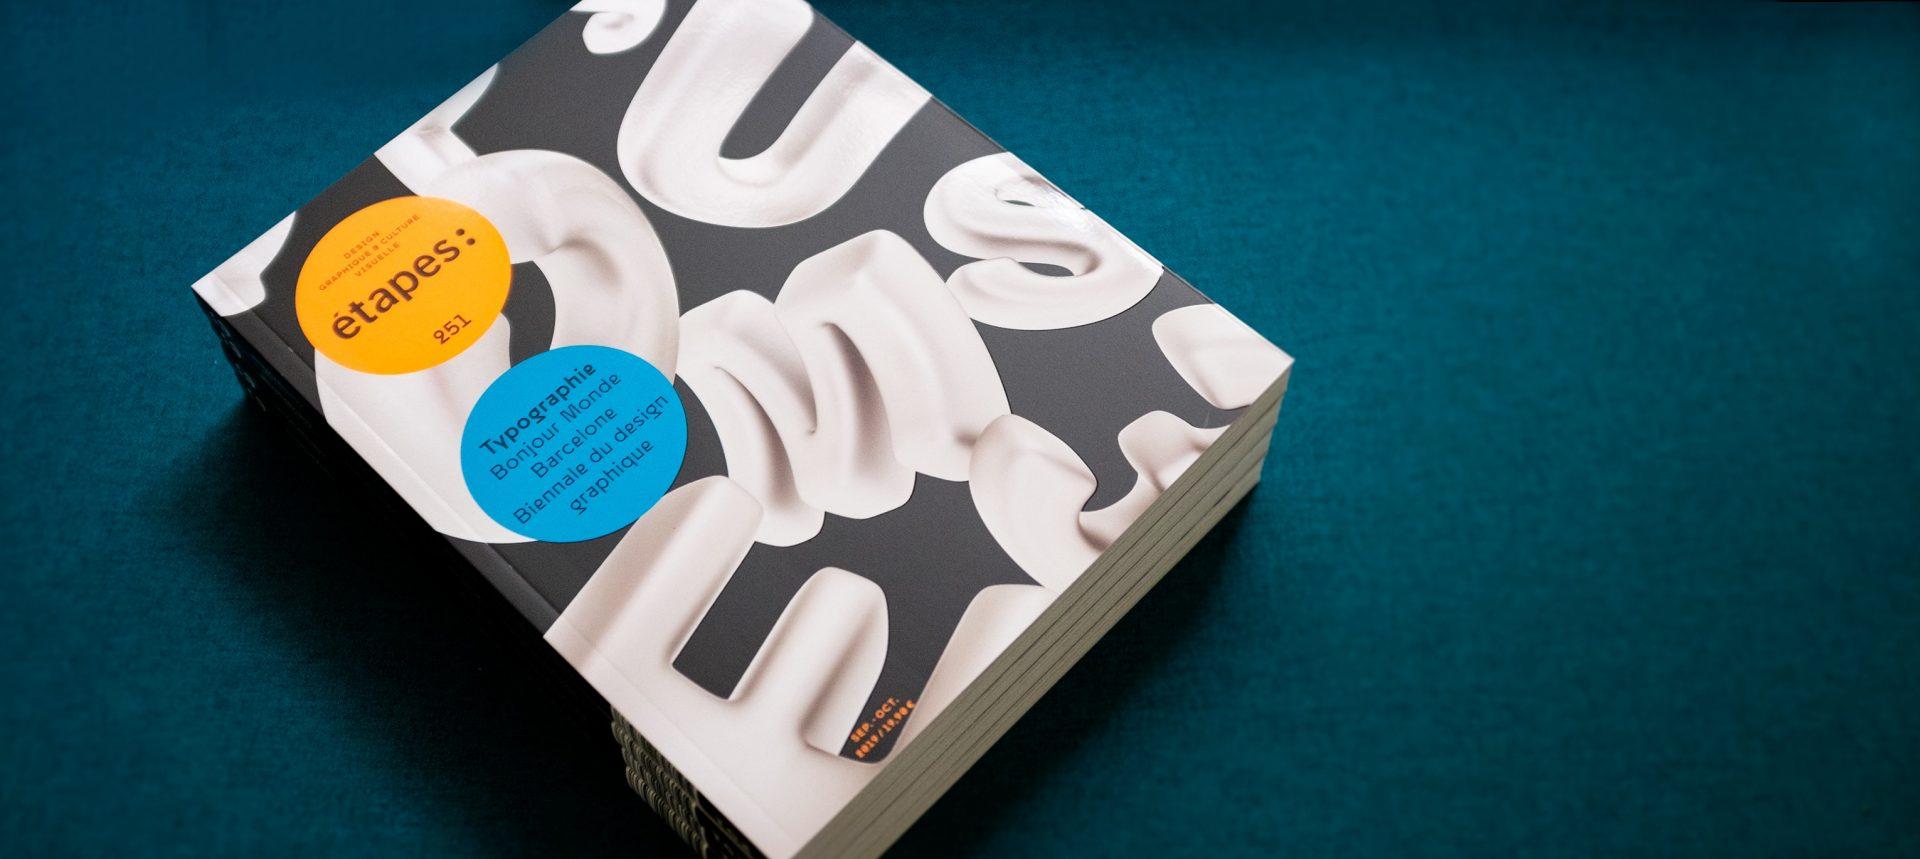 étapes: 251 spécial typographie